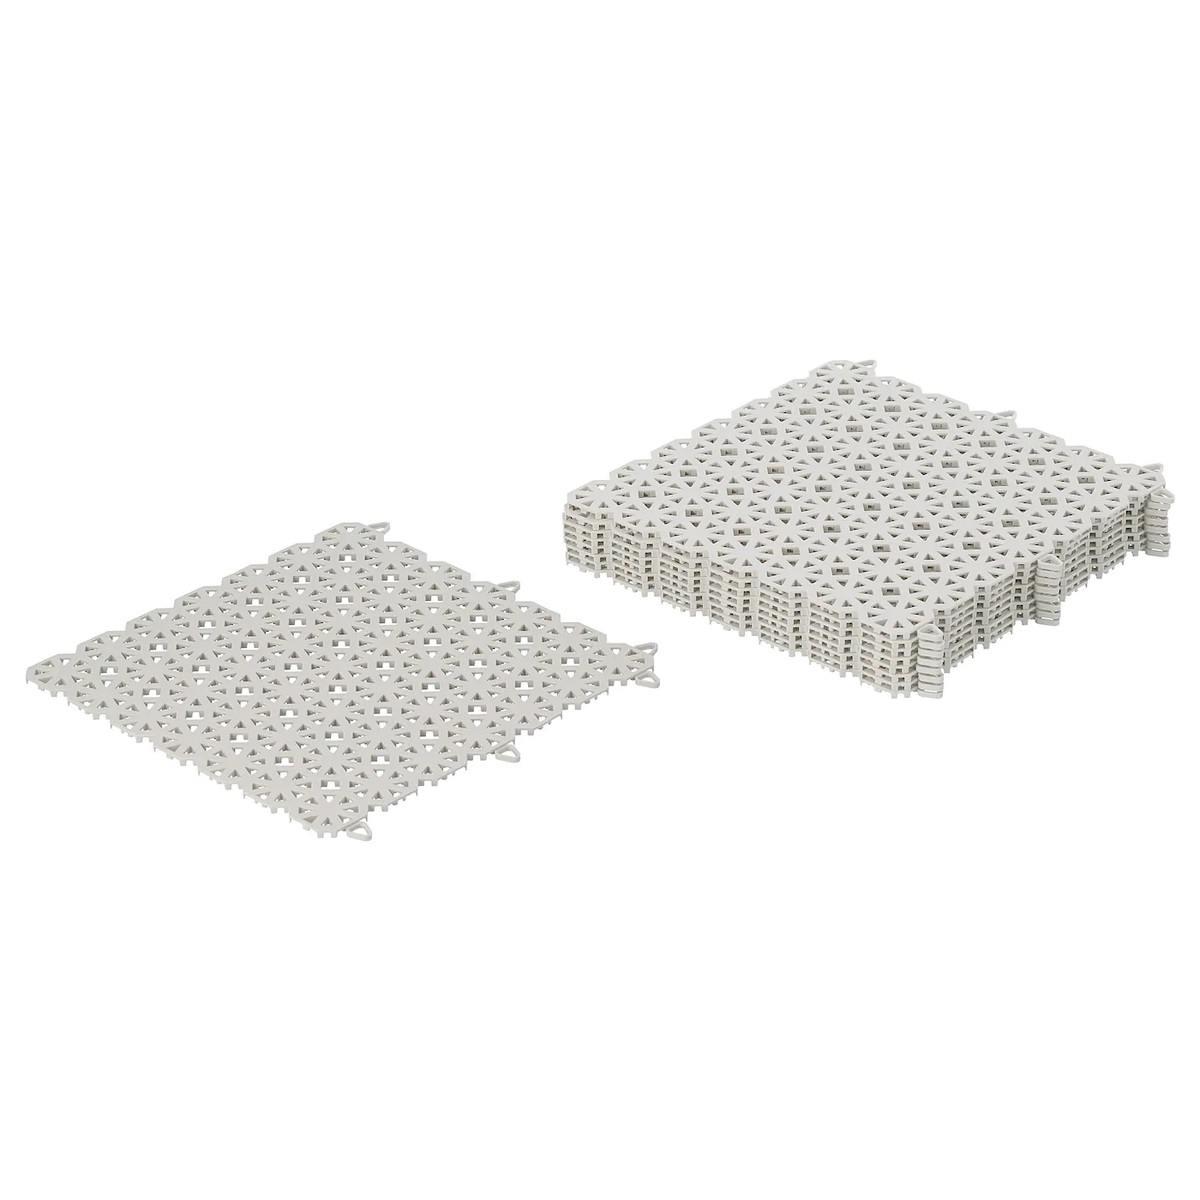 Catalogo parquet IKEA Enero 2021 FOTOS suelo altappen detalle